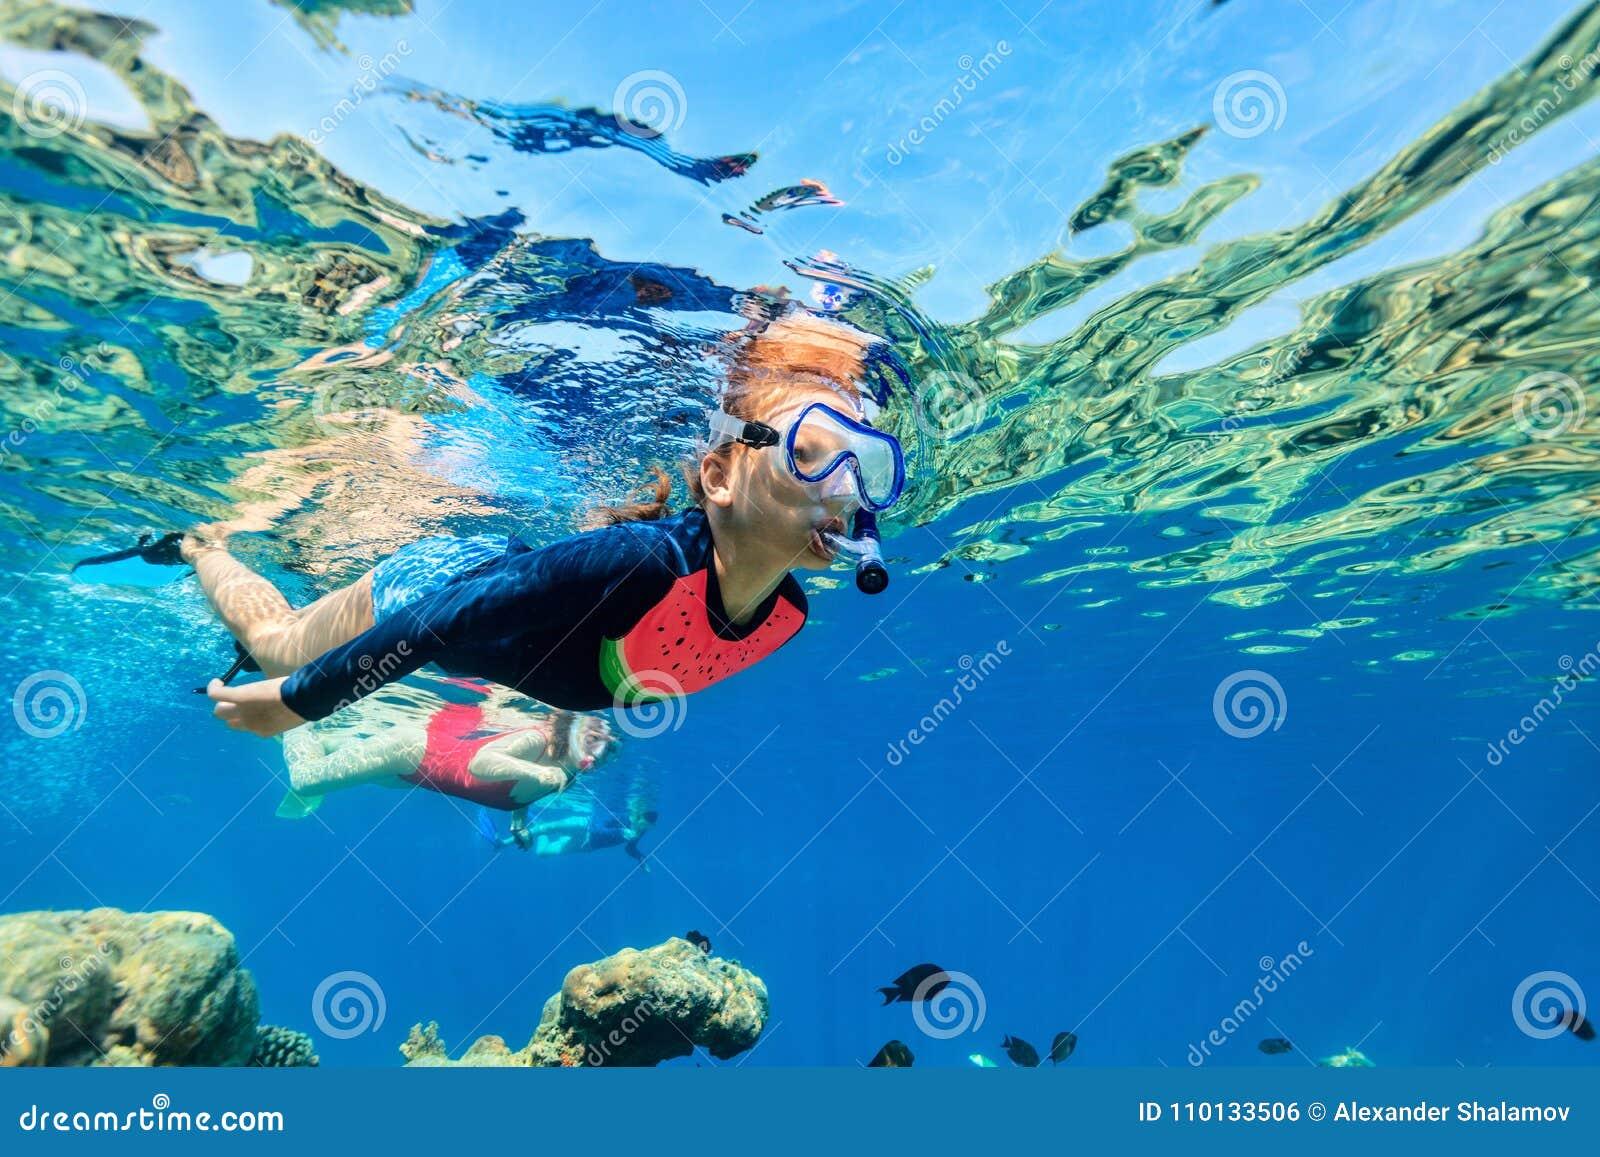 Family snorkeling in ocean